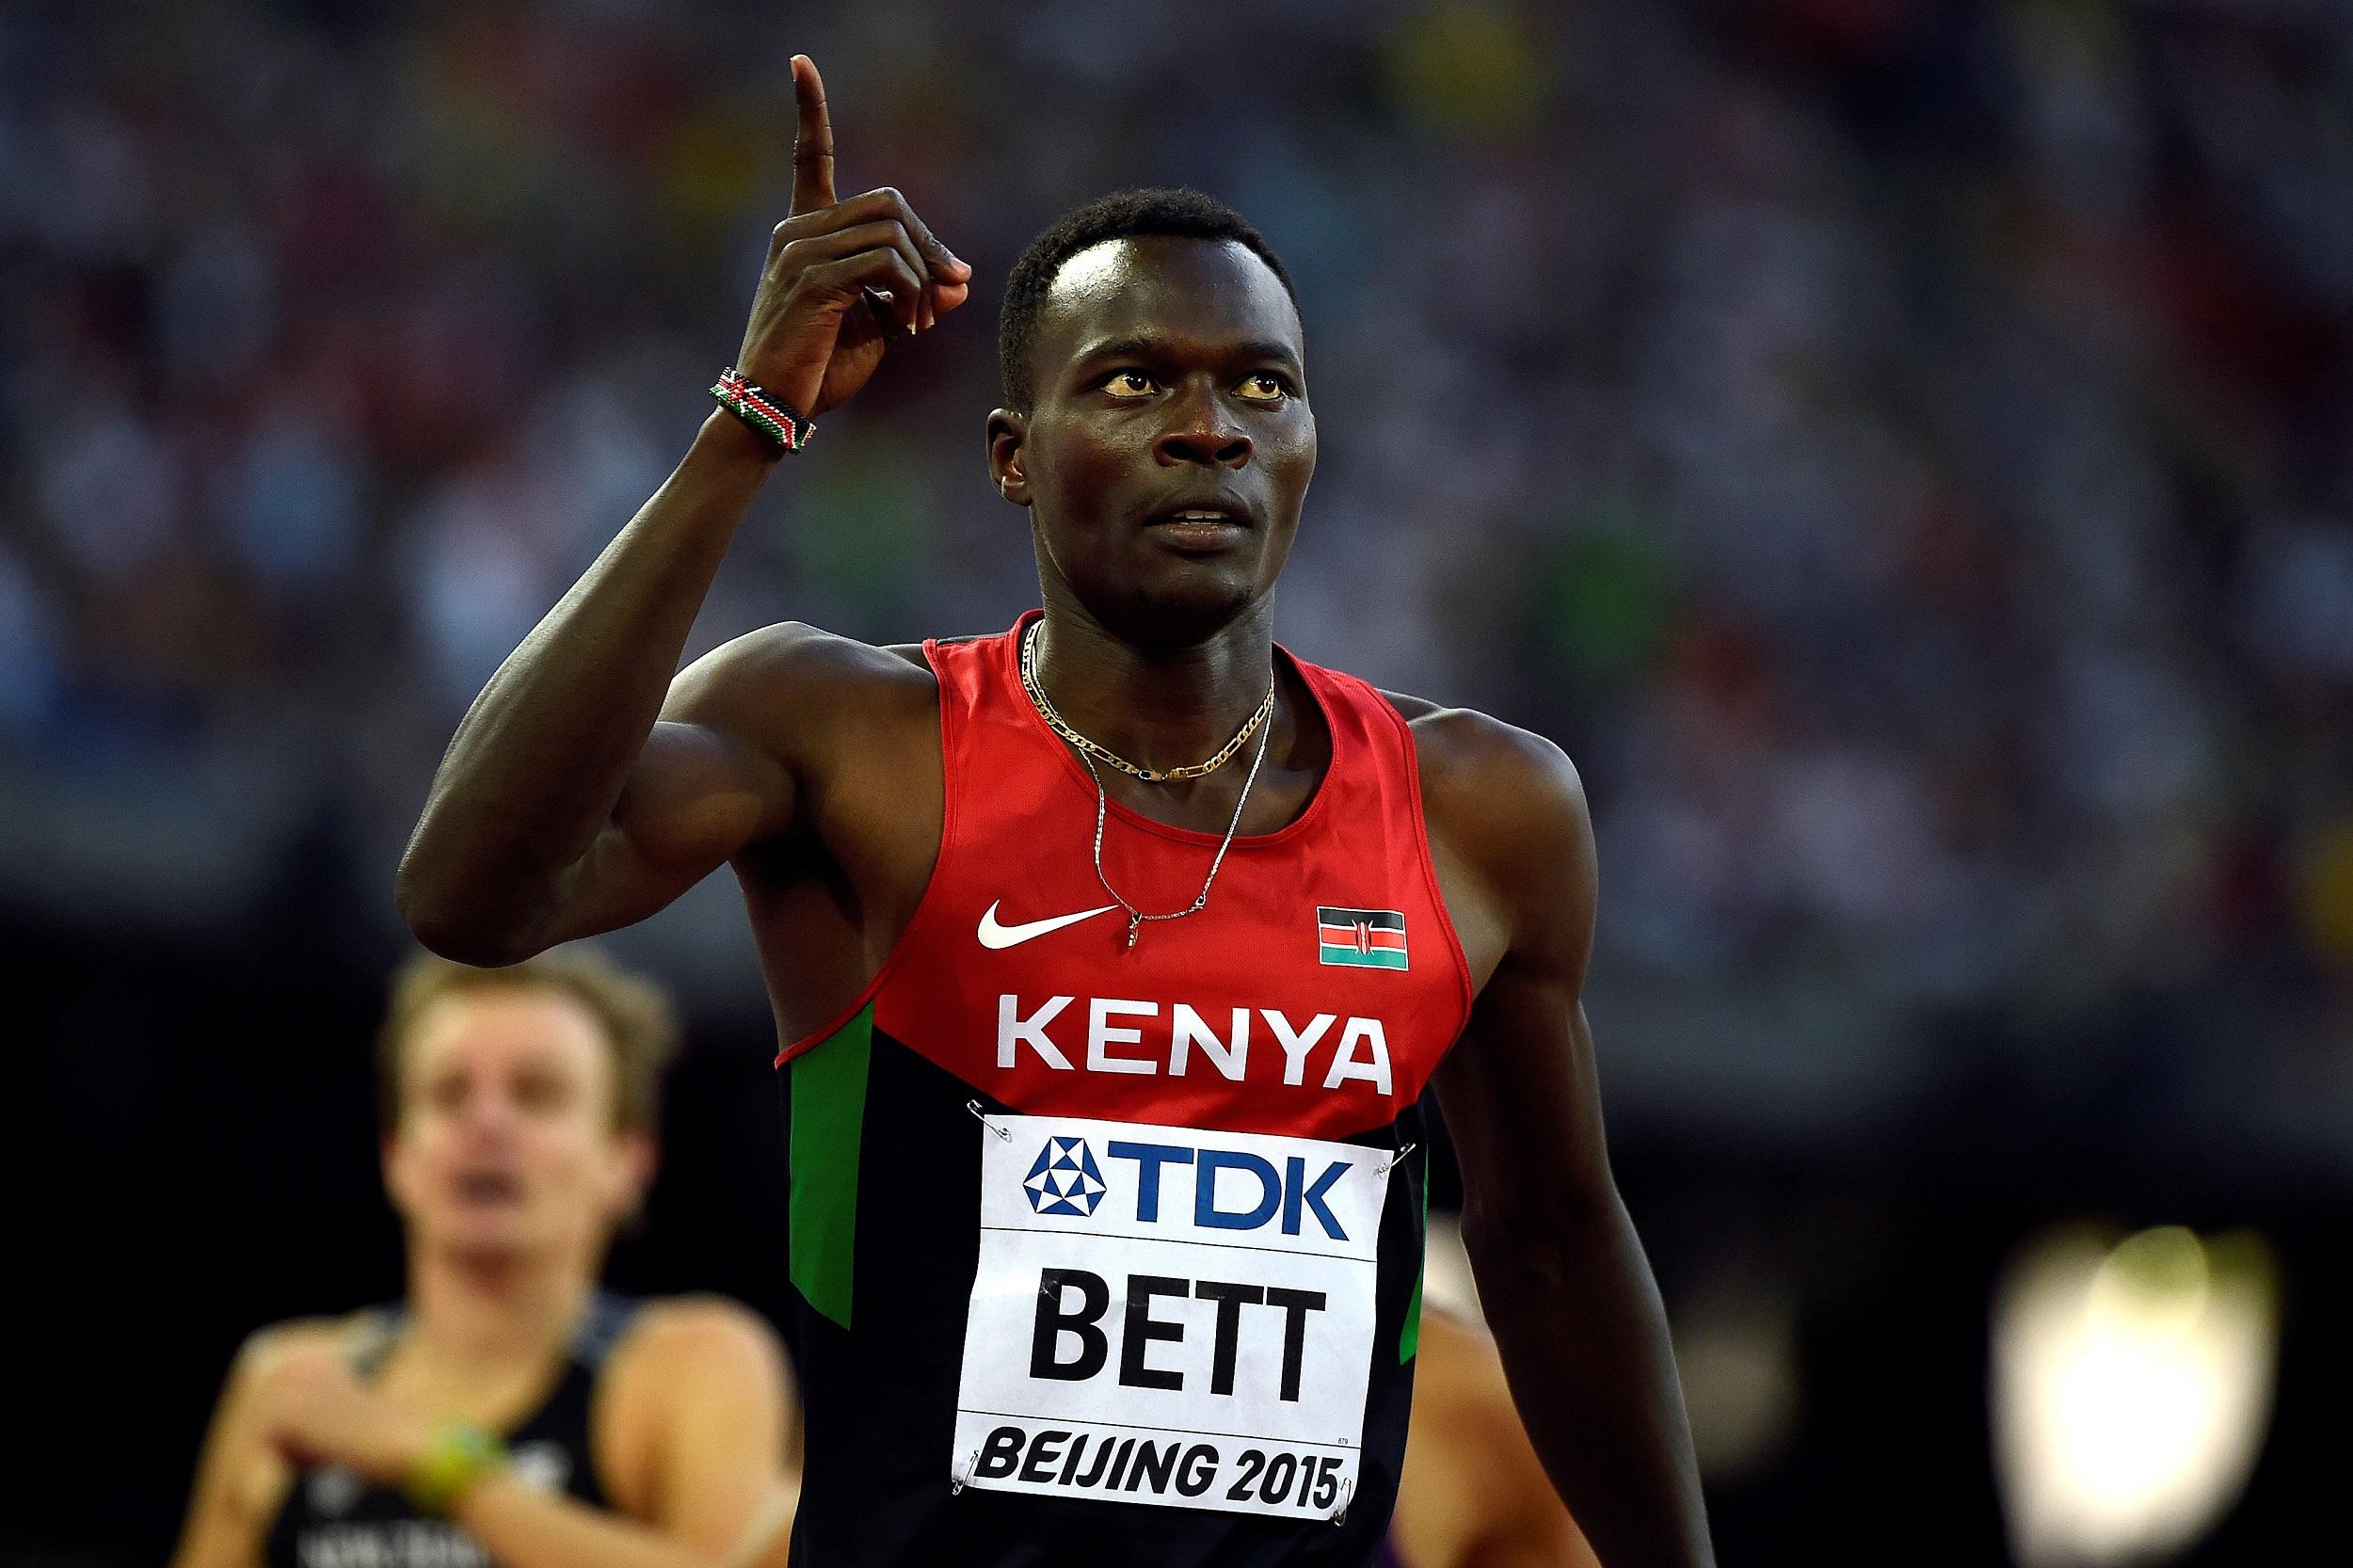 IMG NICHOLAS BETT, Kenya's 400m Hurdles World Champion